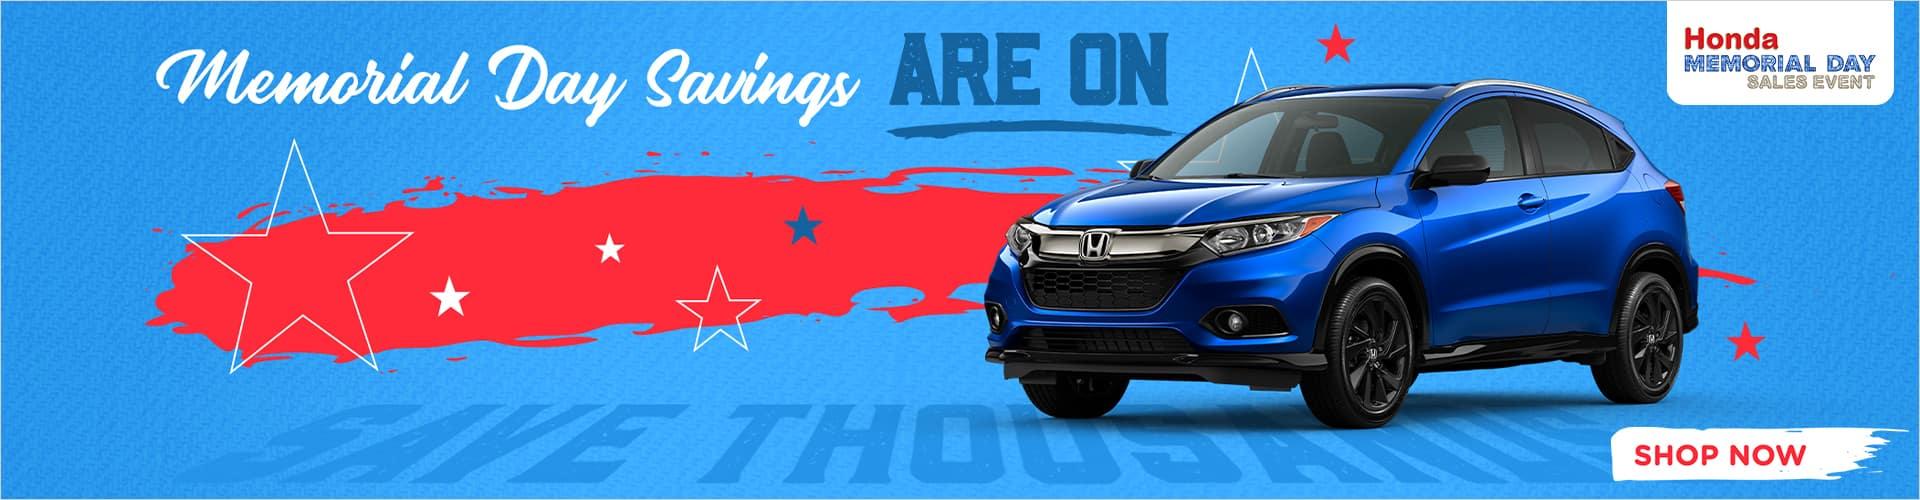 Memorial Day Savings are on at Honda